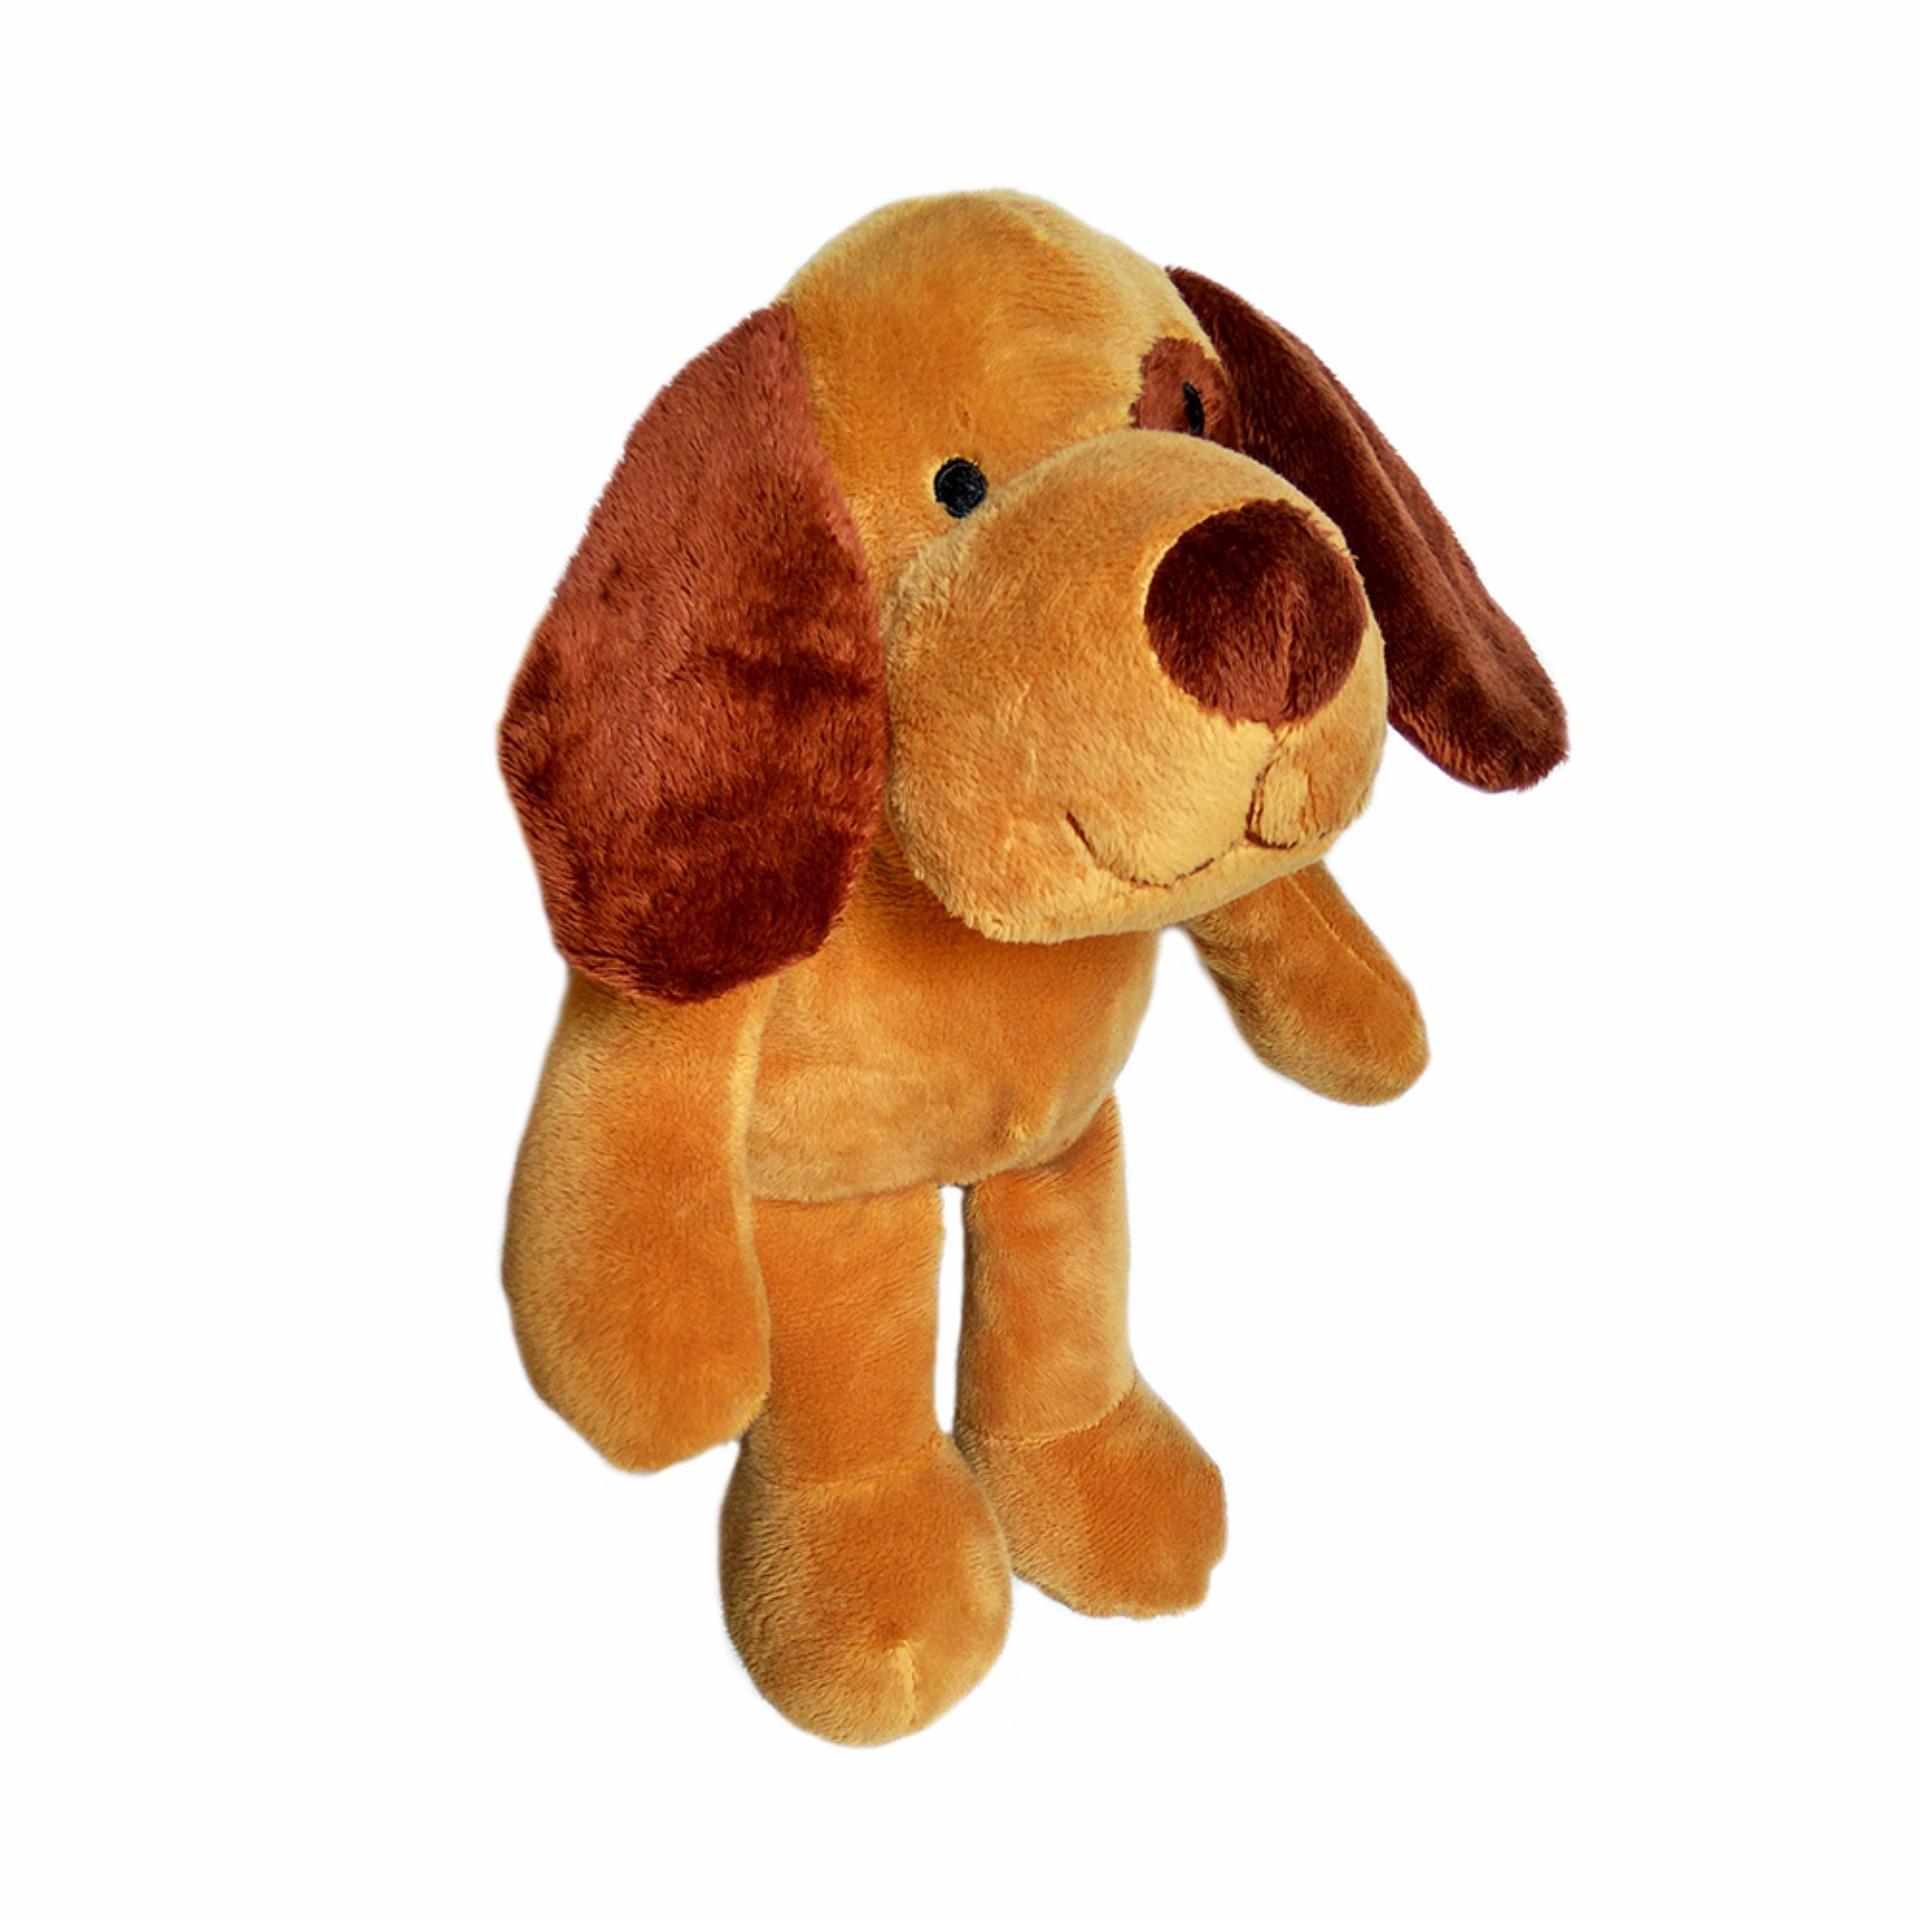 Toylogy Koleksi Boneka Hewan Kelinci Anjing Kuda Nil ( Rabbit Stuffed Plush  Animal Doll For Baby 3b258781b6